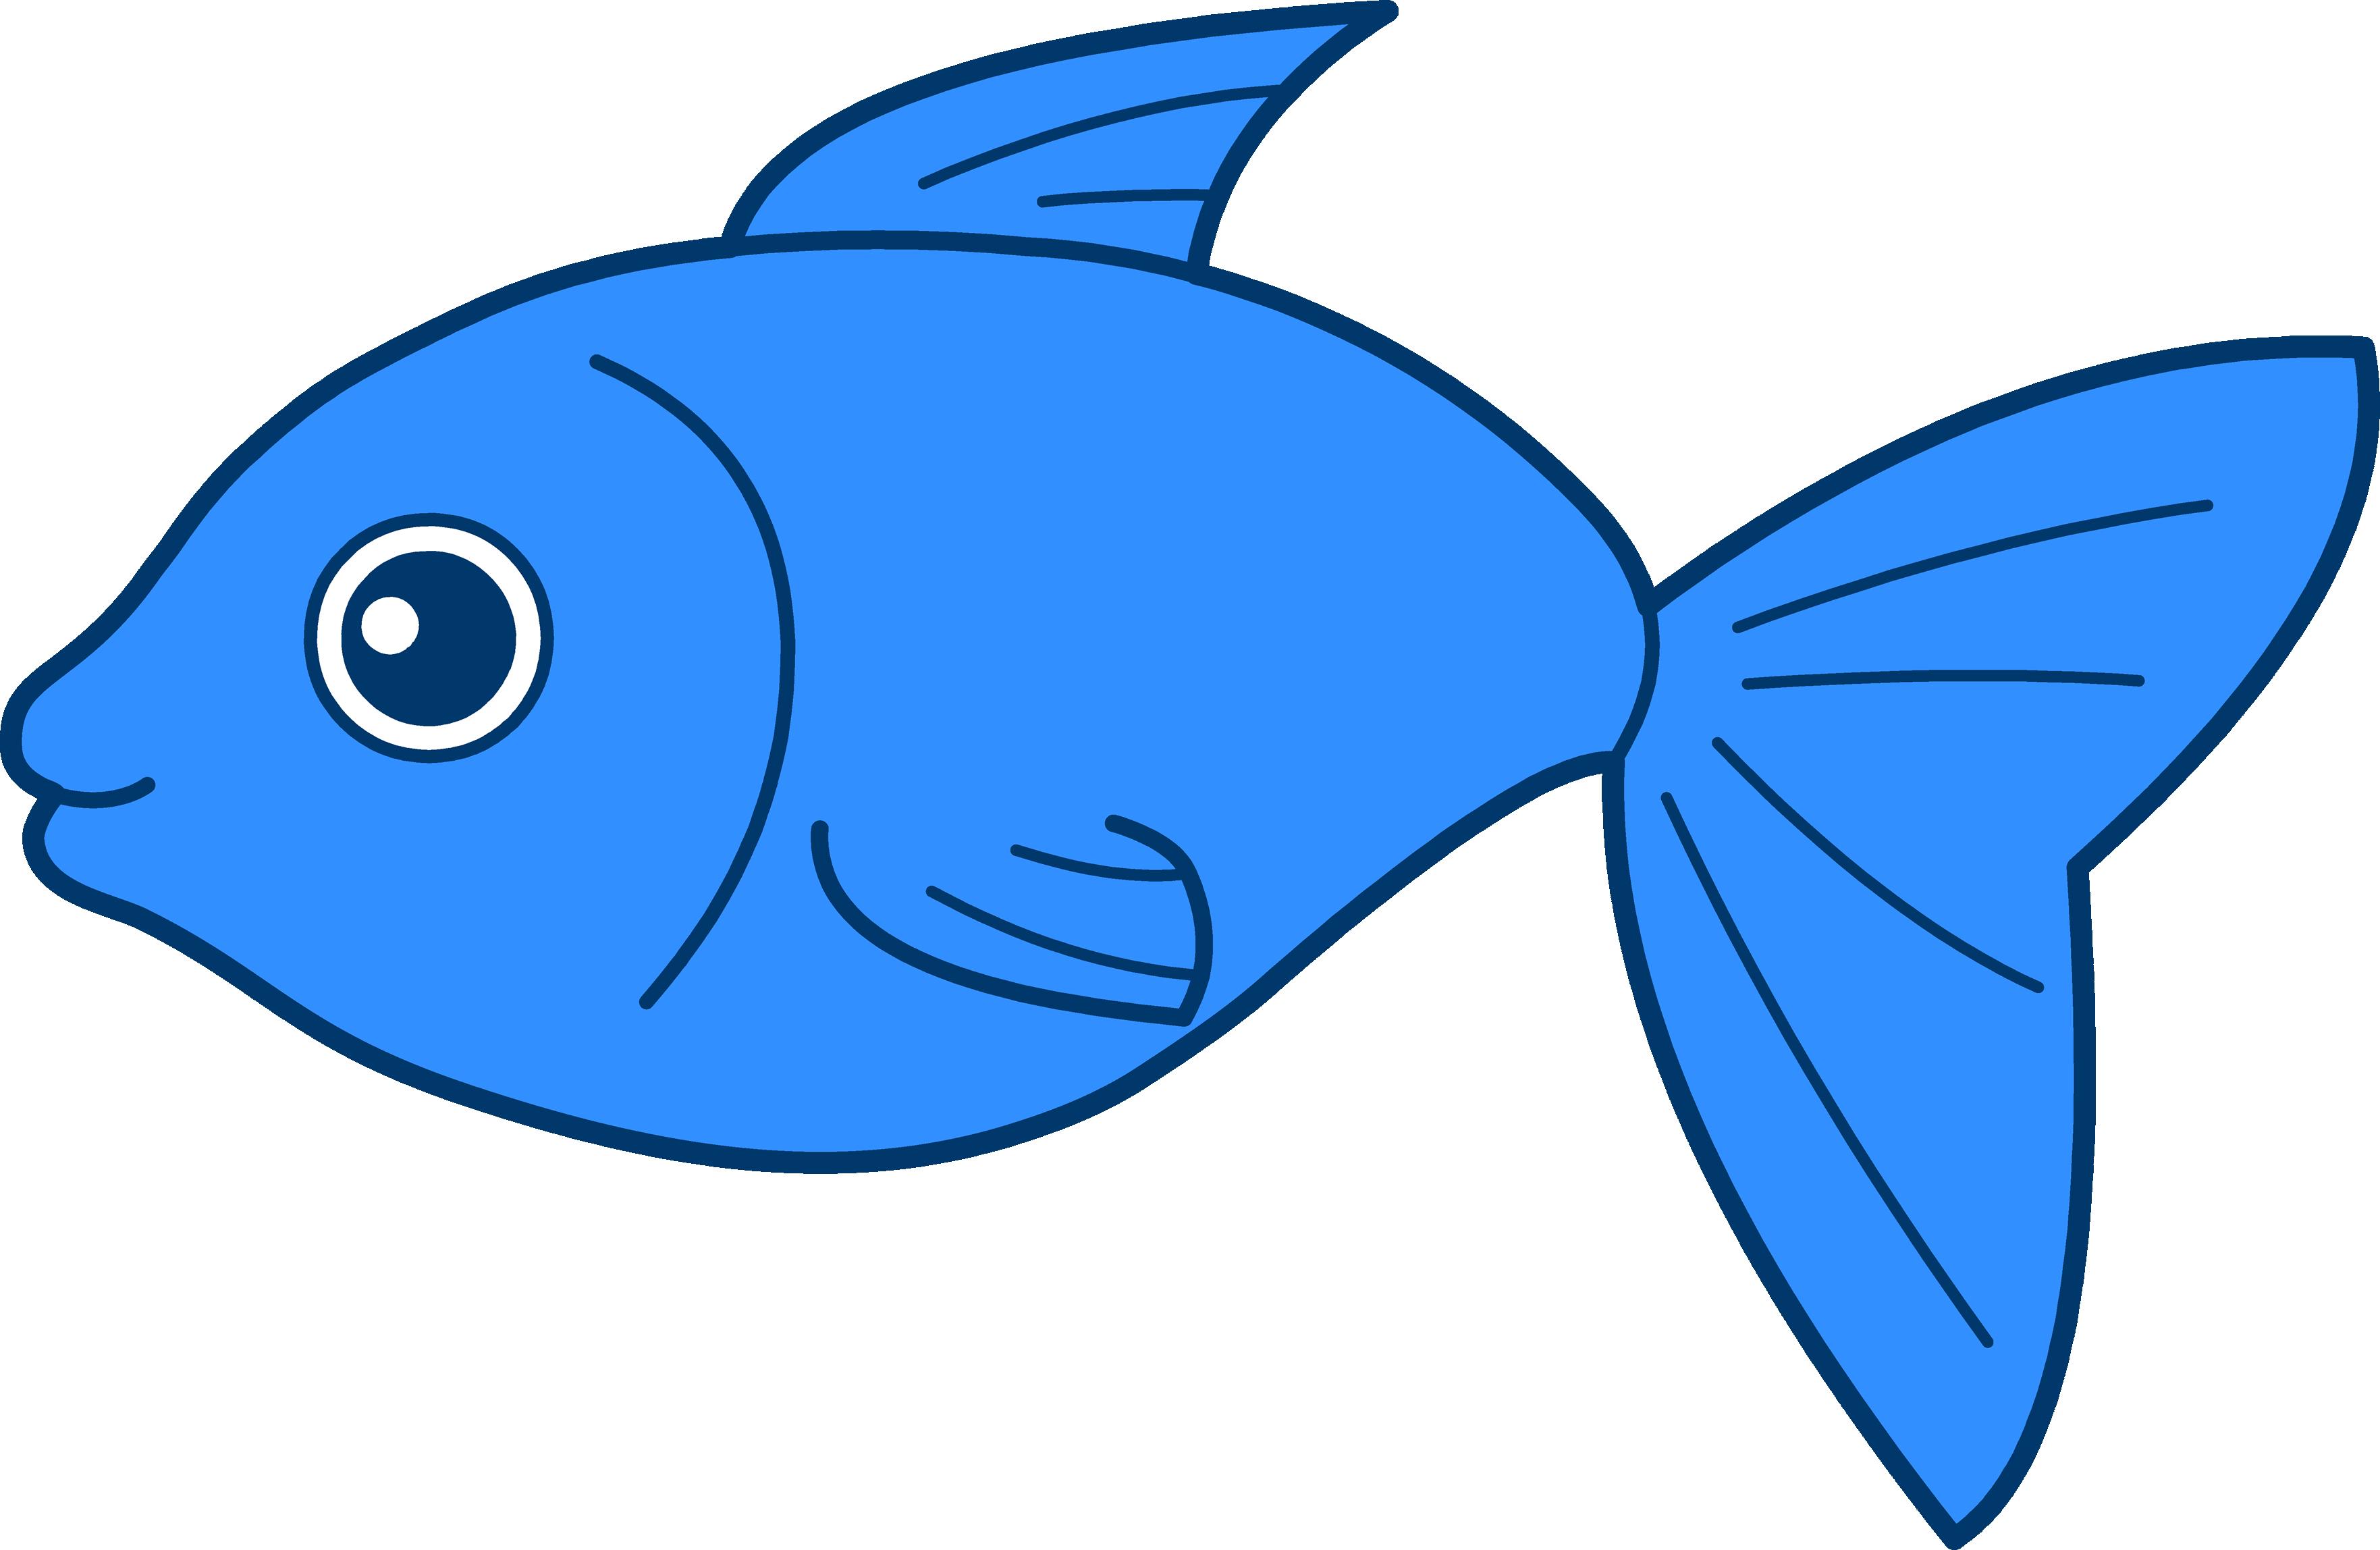 Clip art transparent background. Fish clipart creepy